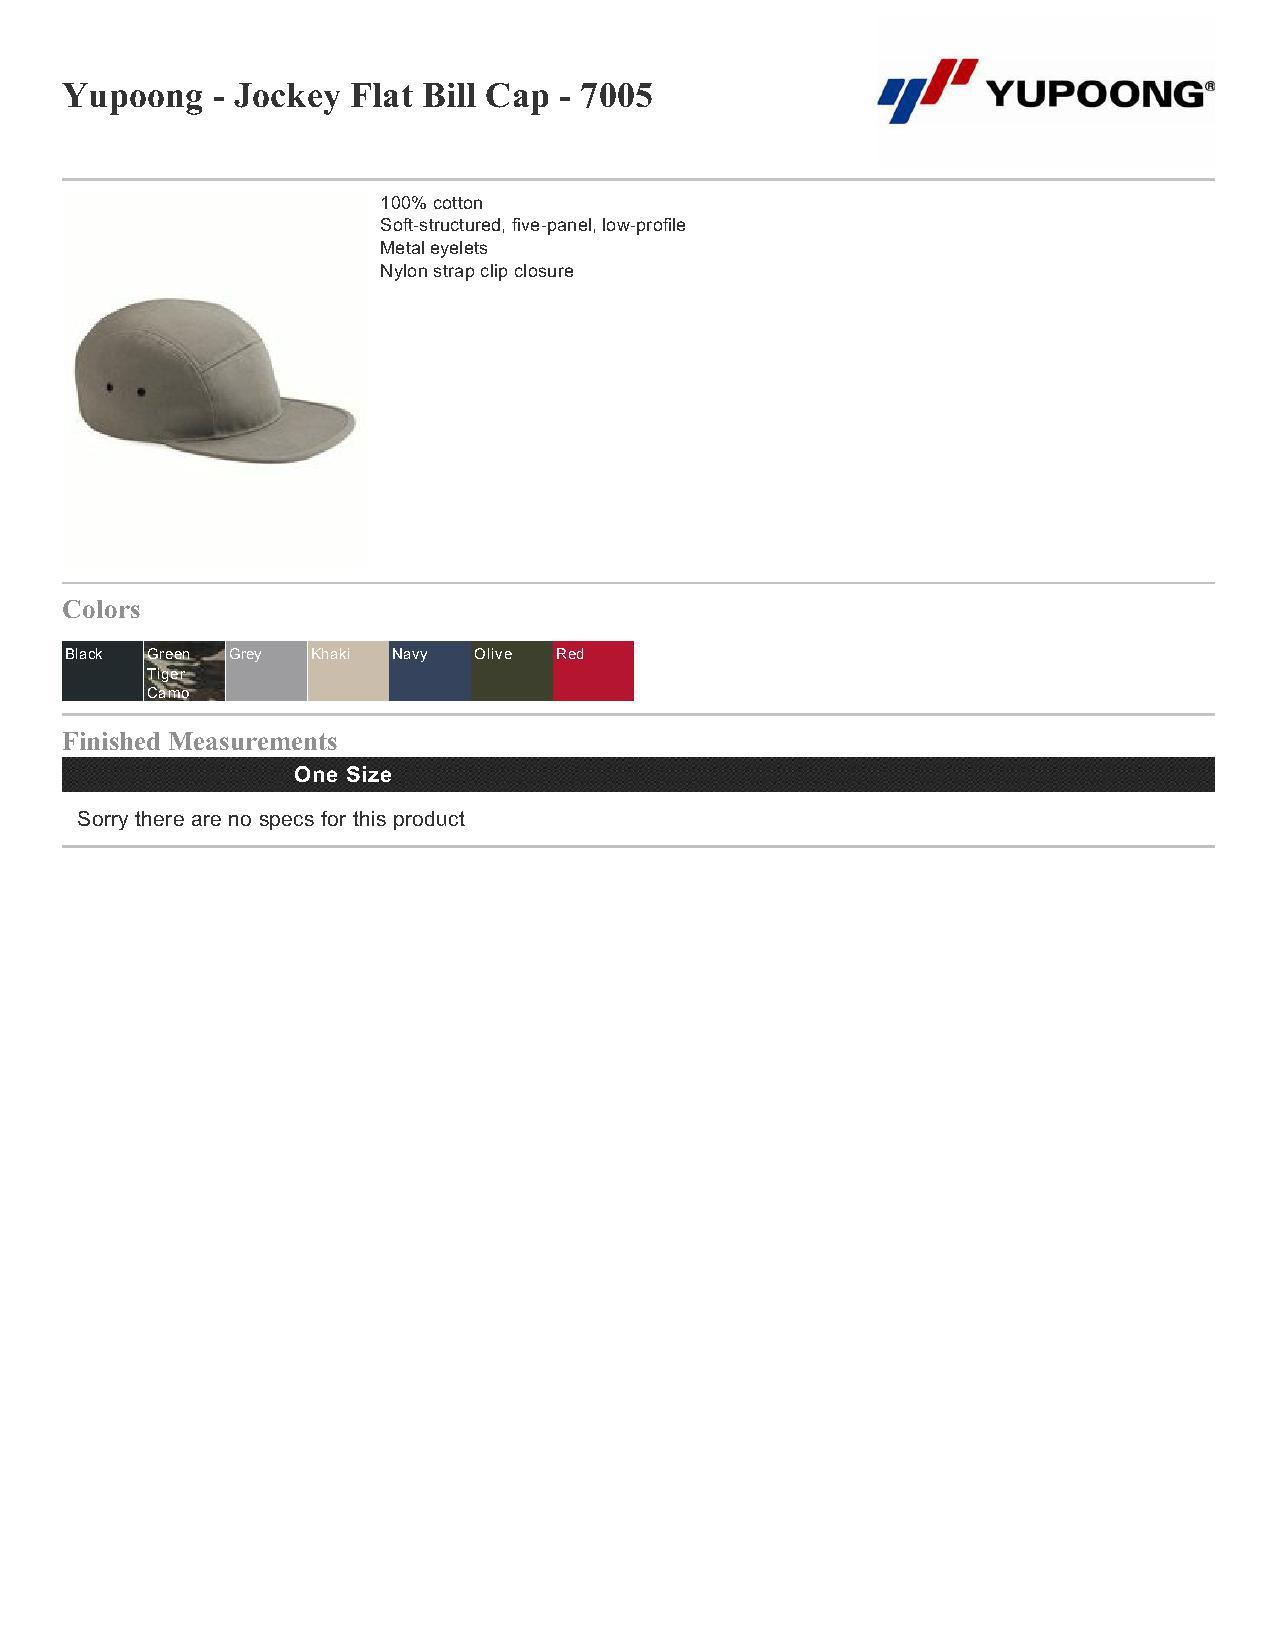 Yupoong Jockey Flat Bill Cap - 7005  4.68 - Headwear a7e710ffd56